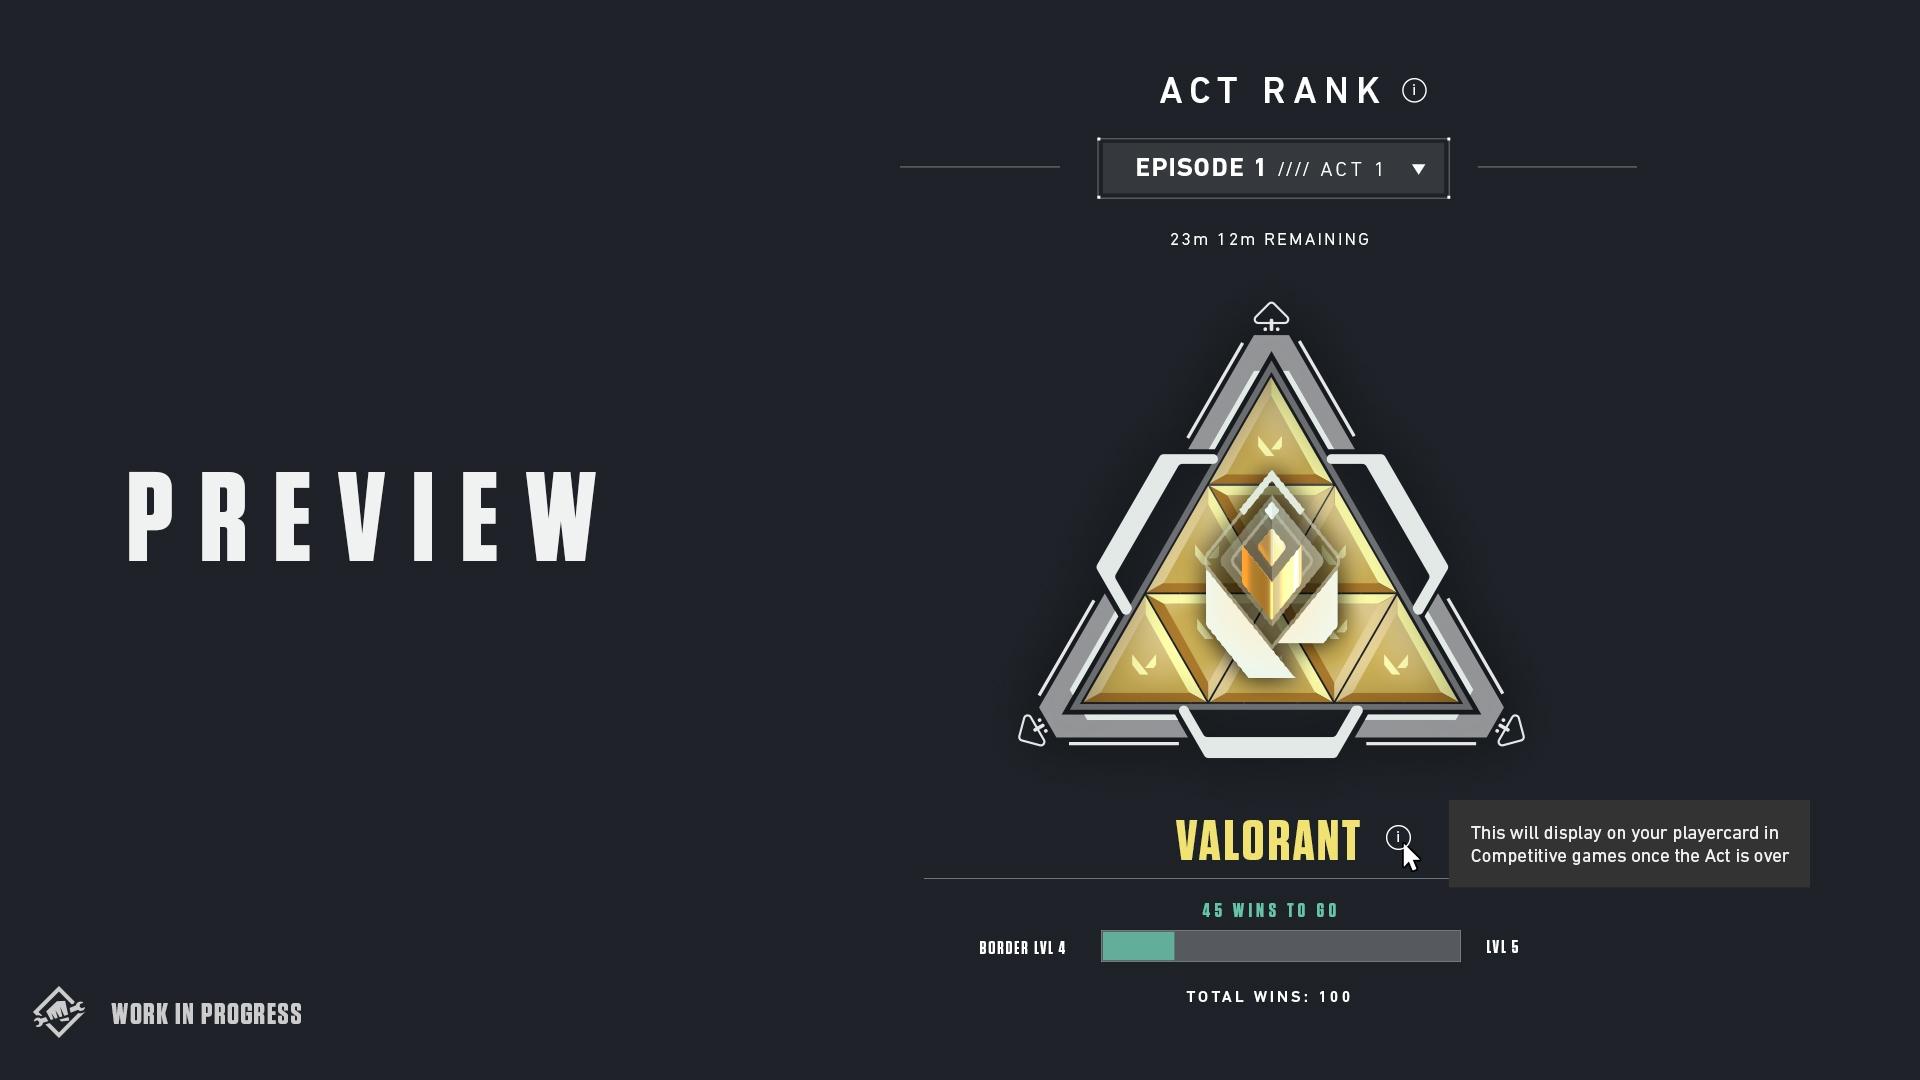 Valorant's act rank badge